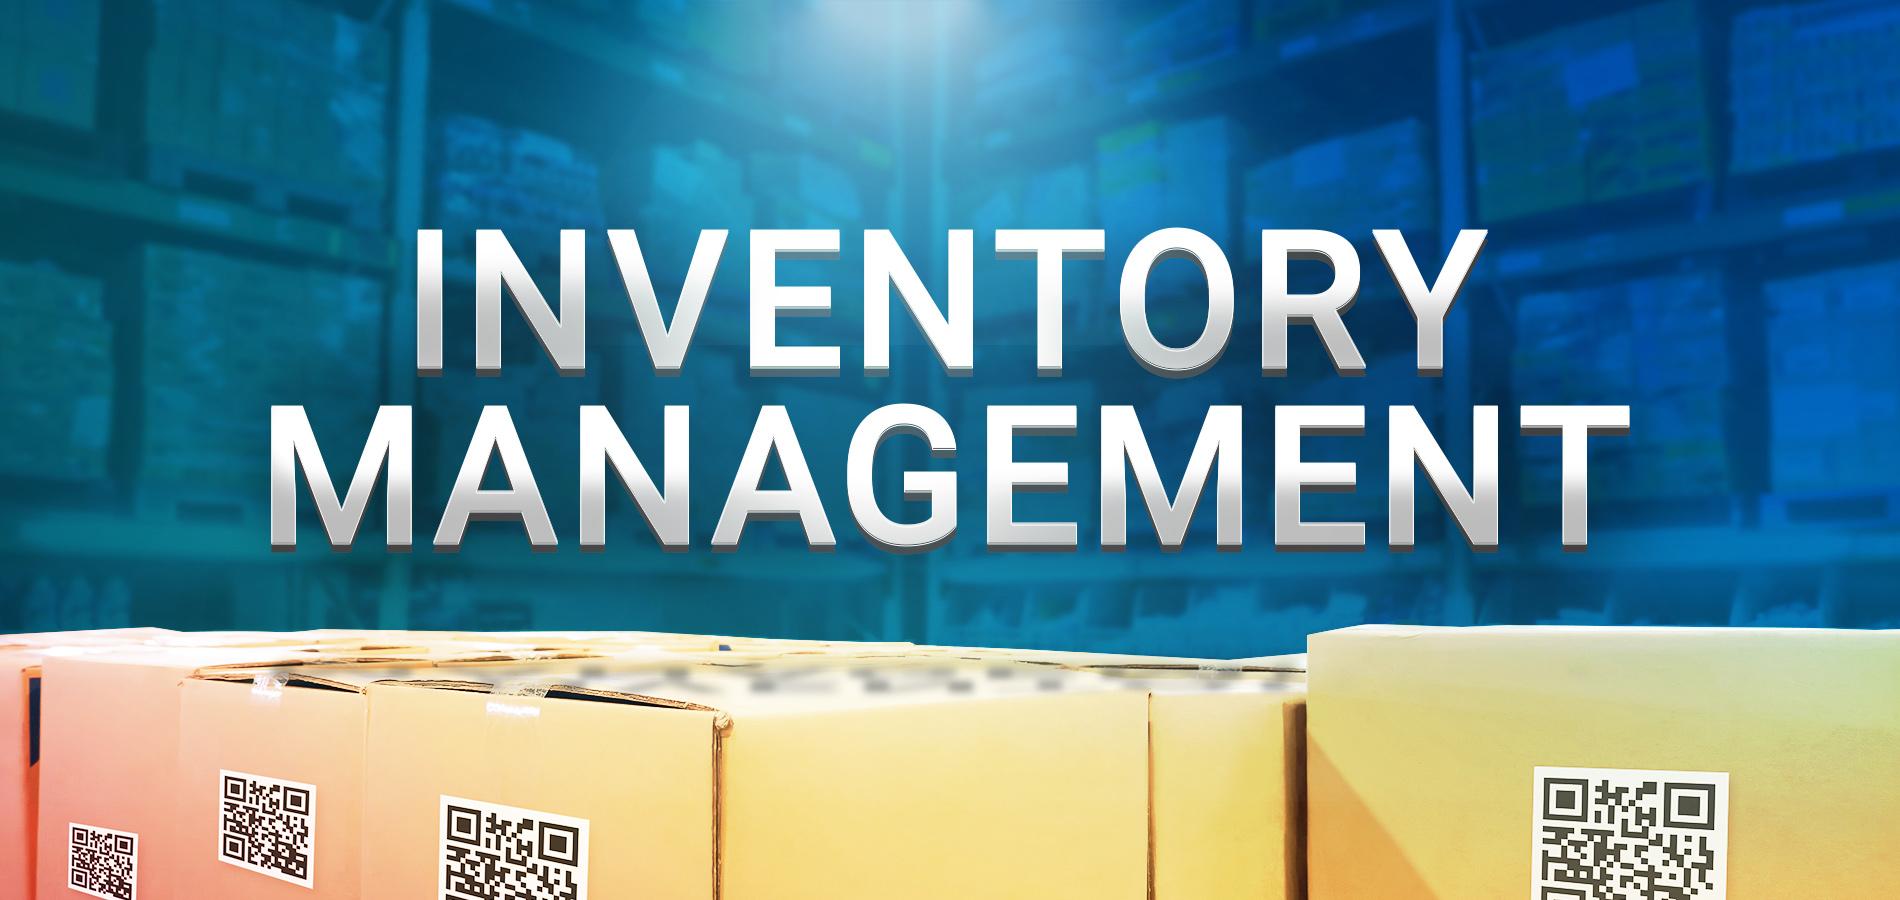 3 inventory management strategies